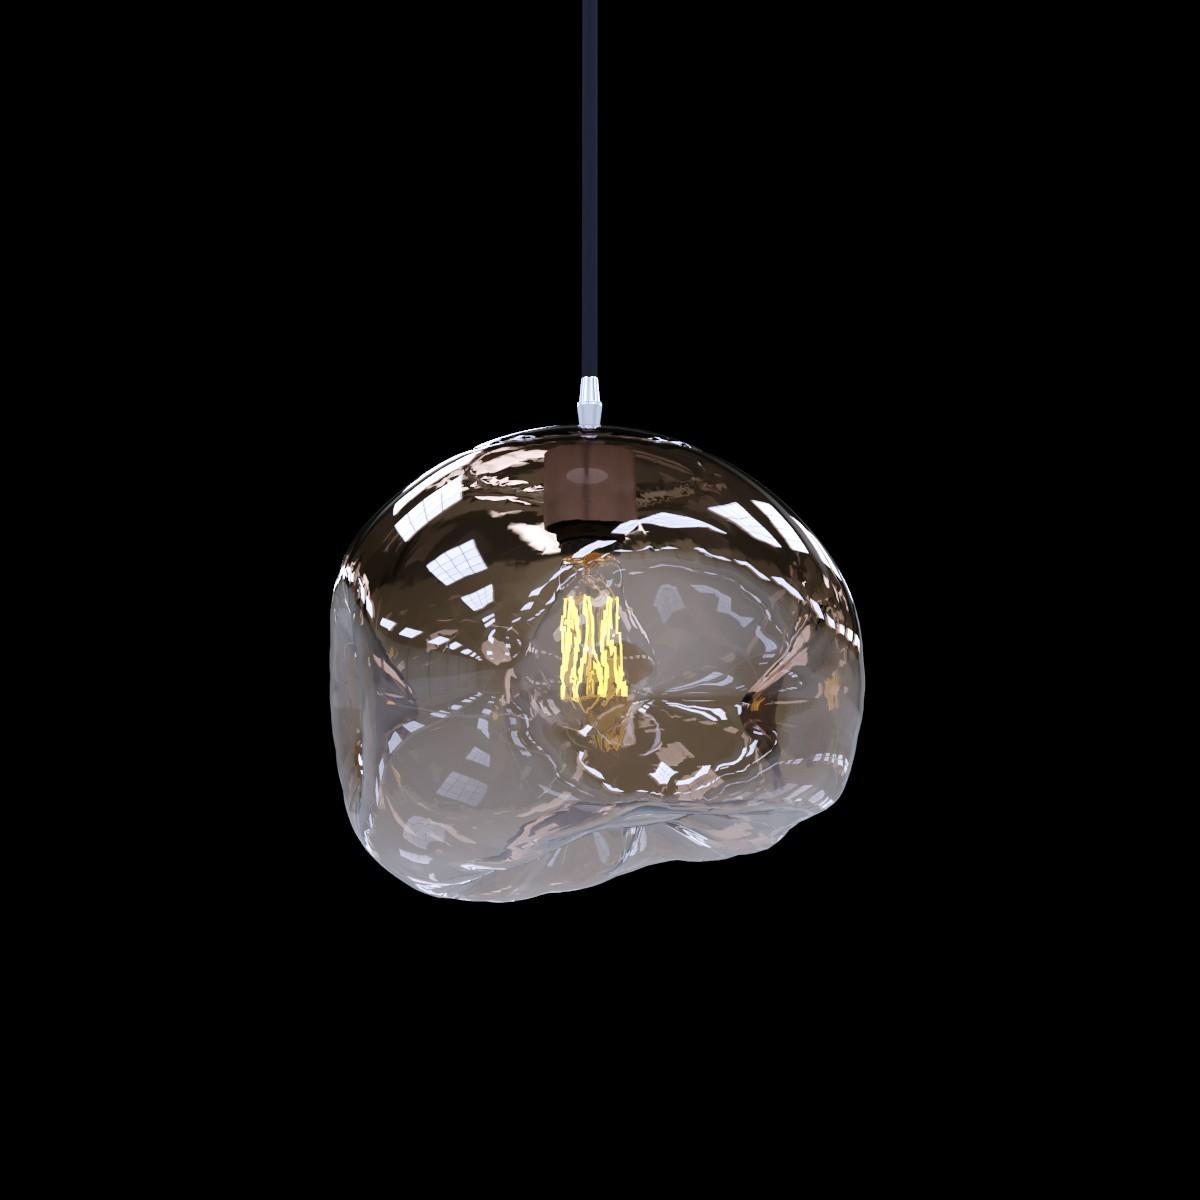 Подвесной светильник Loft It Melt LOFT2025-CH, 1xE27x40W, хром, металл, стекло - фото 3